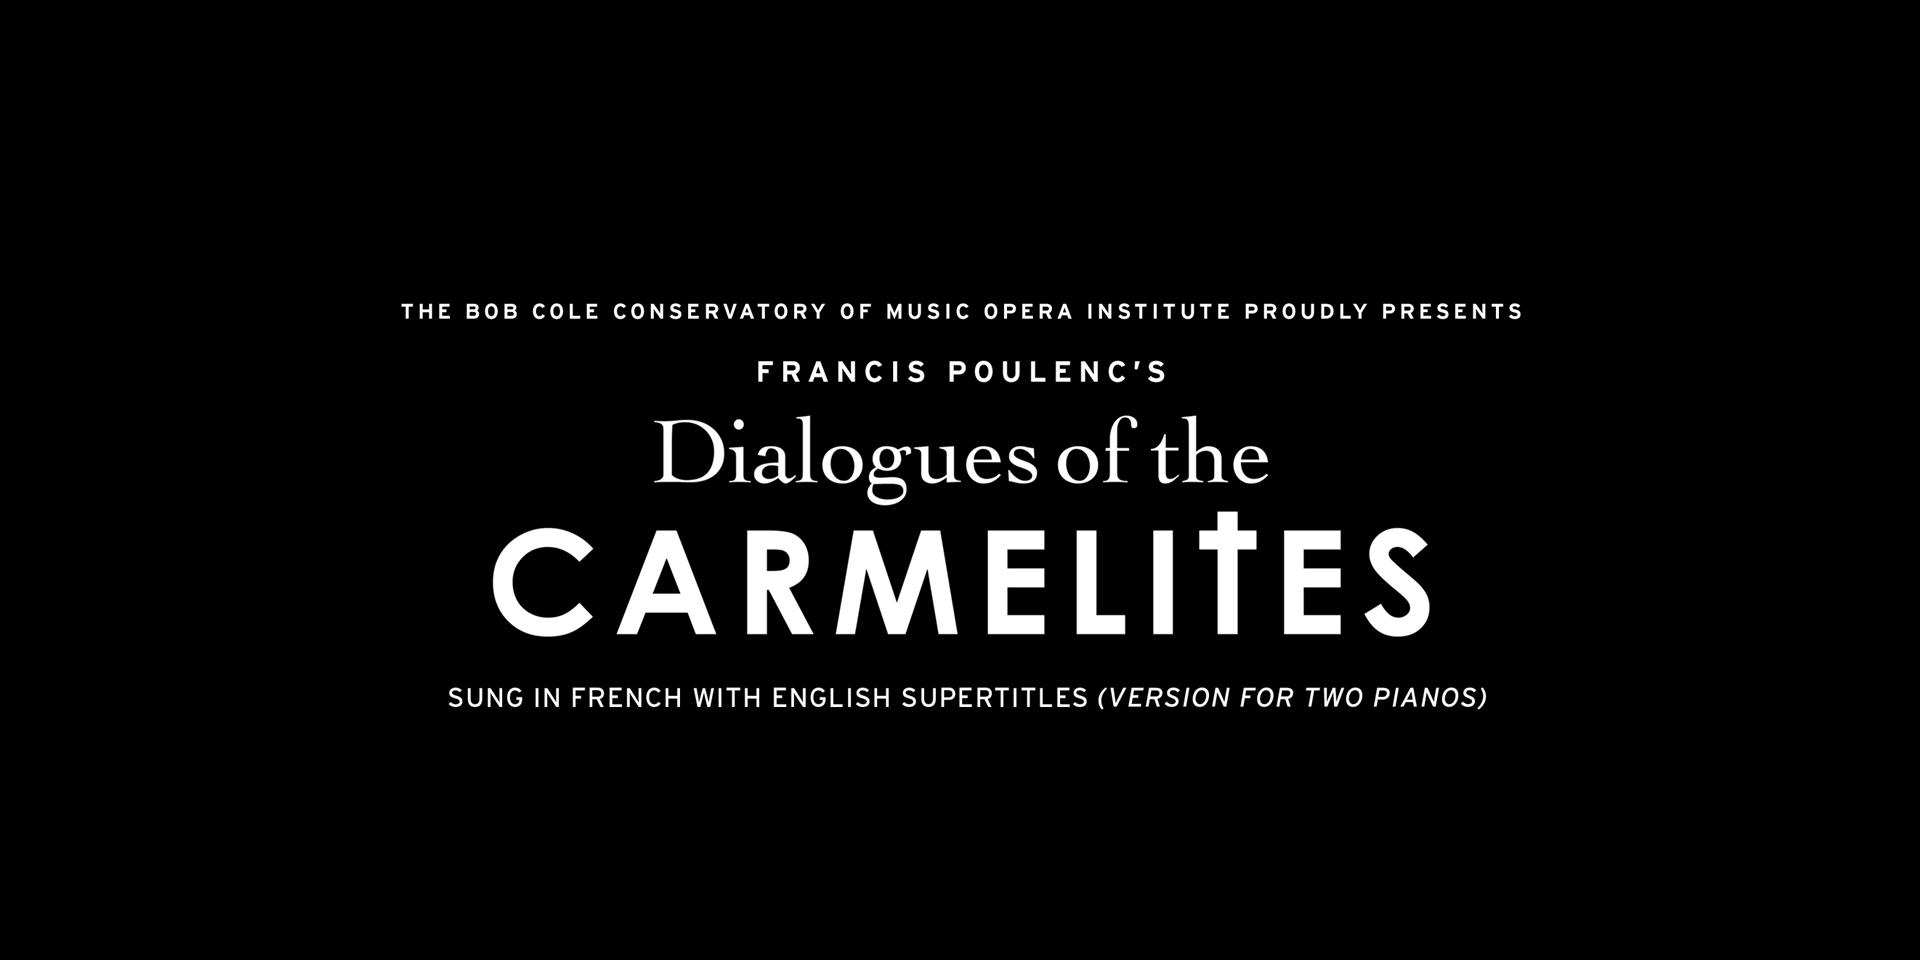 carmelites2.jpg